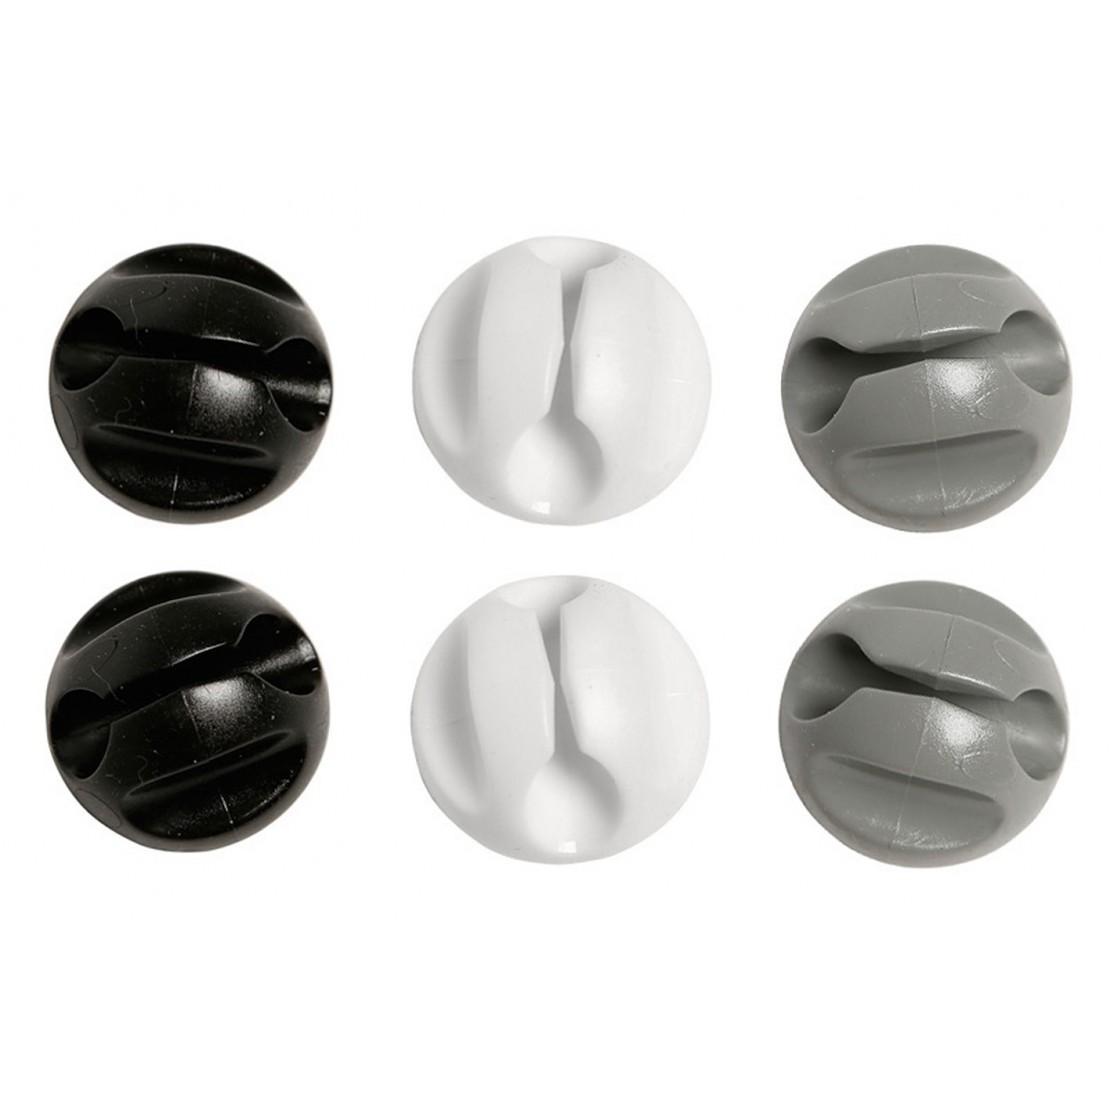 Bases kabels binding2x zwart,2x grijs, 2x witte